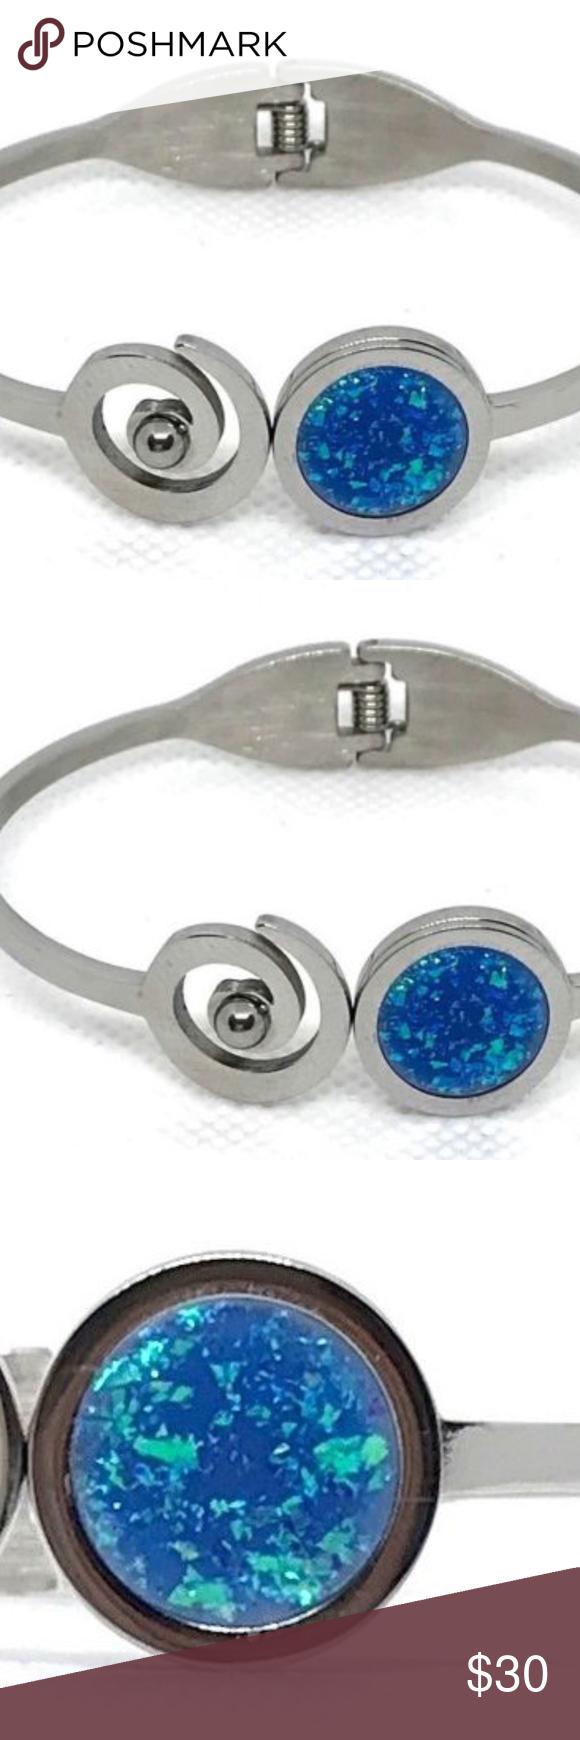 Hurricane Opal Bracelet Key West Hurricane Opal Bracelet When You Live And Play In Paradise Mother Of Nature Occasionally Opal Bracelet Hurricane Opal Opal